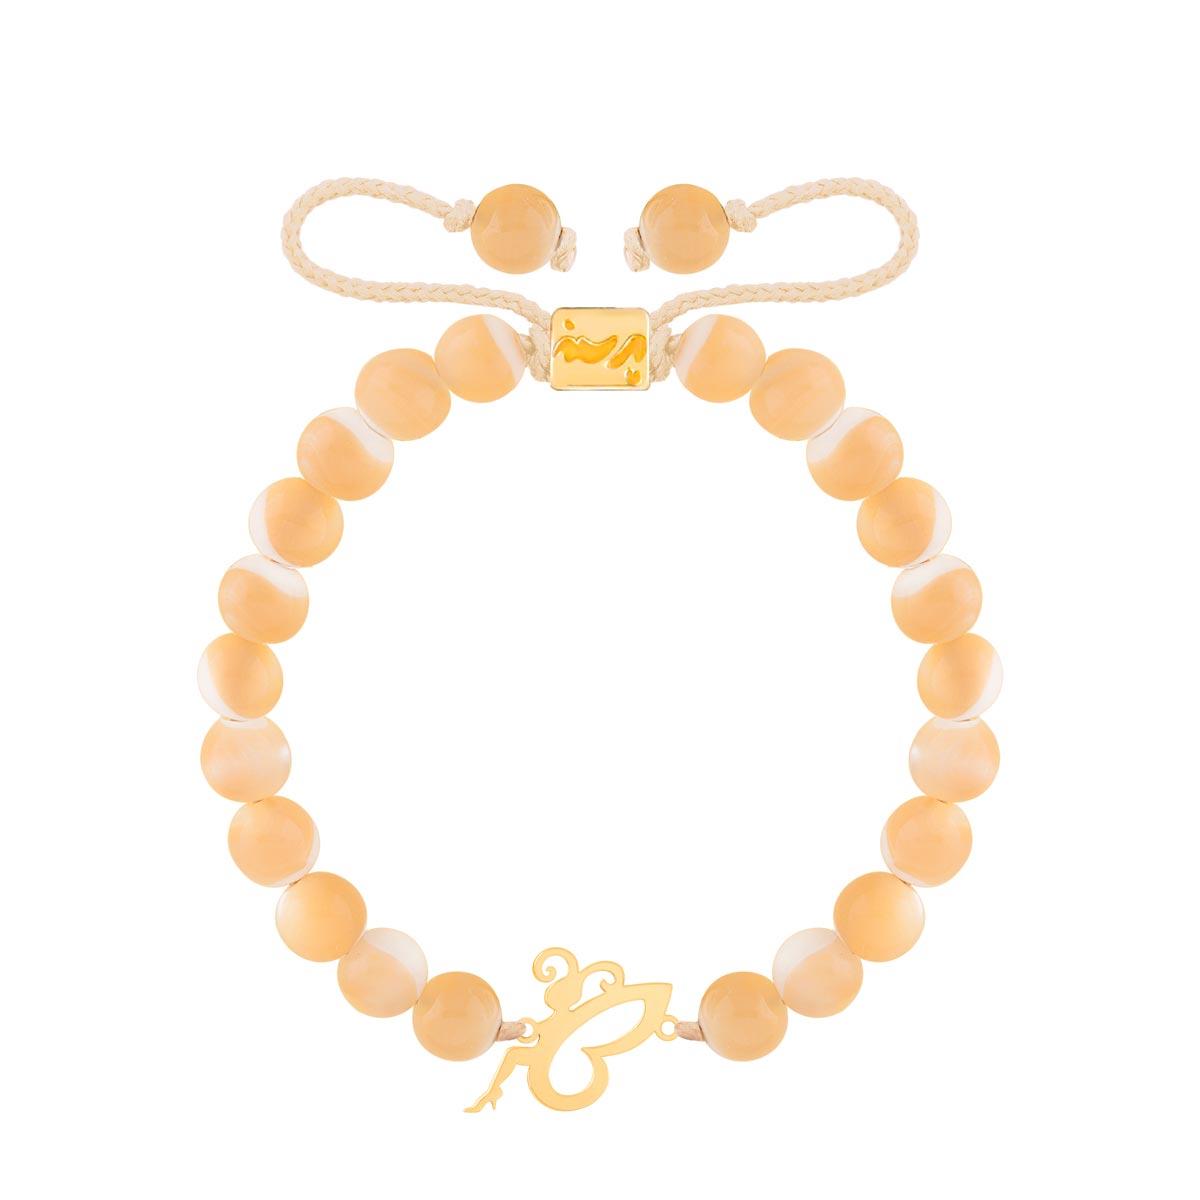 دستبند طلا سنگی ( تینکربل )